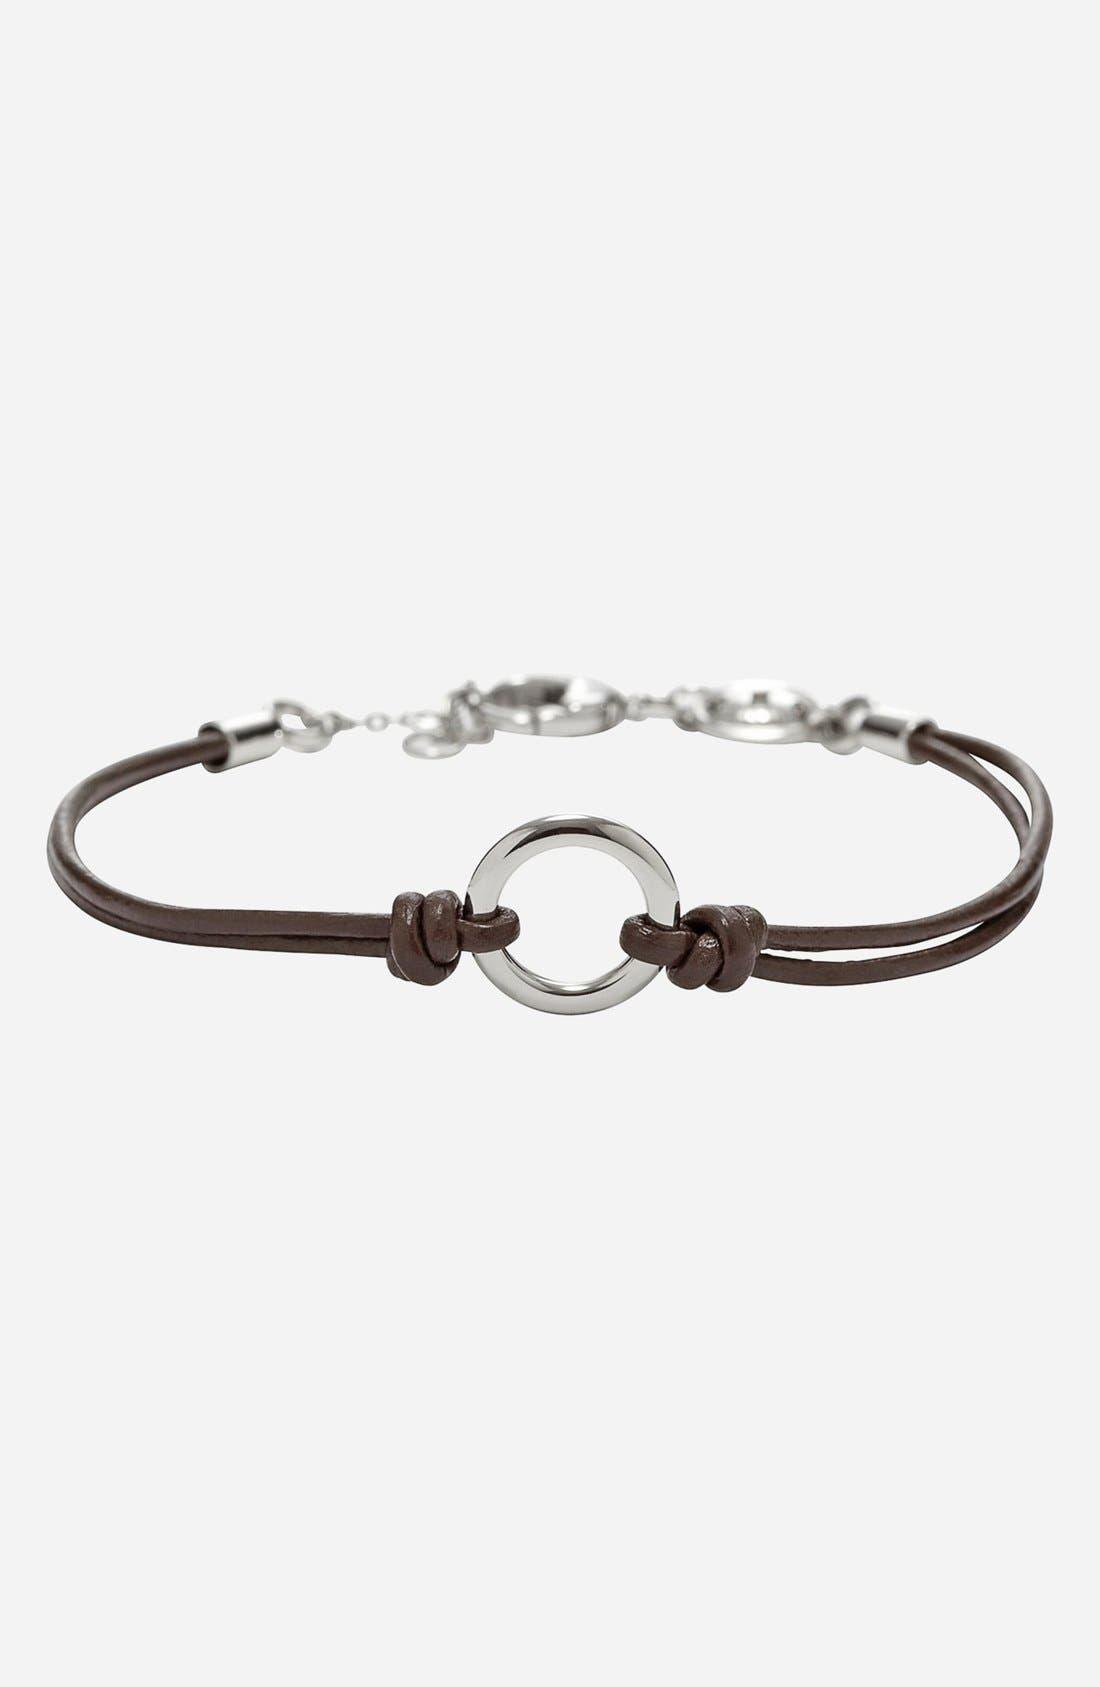 Alternate Image 1 Selected - Fossil Leather Charm Bracelet